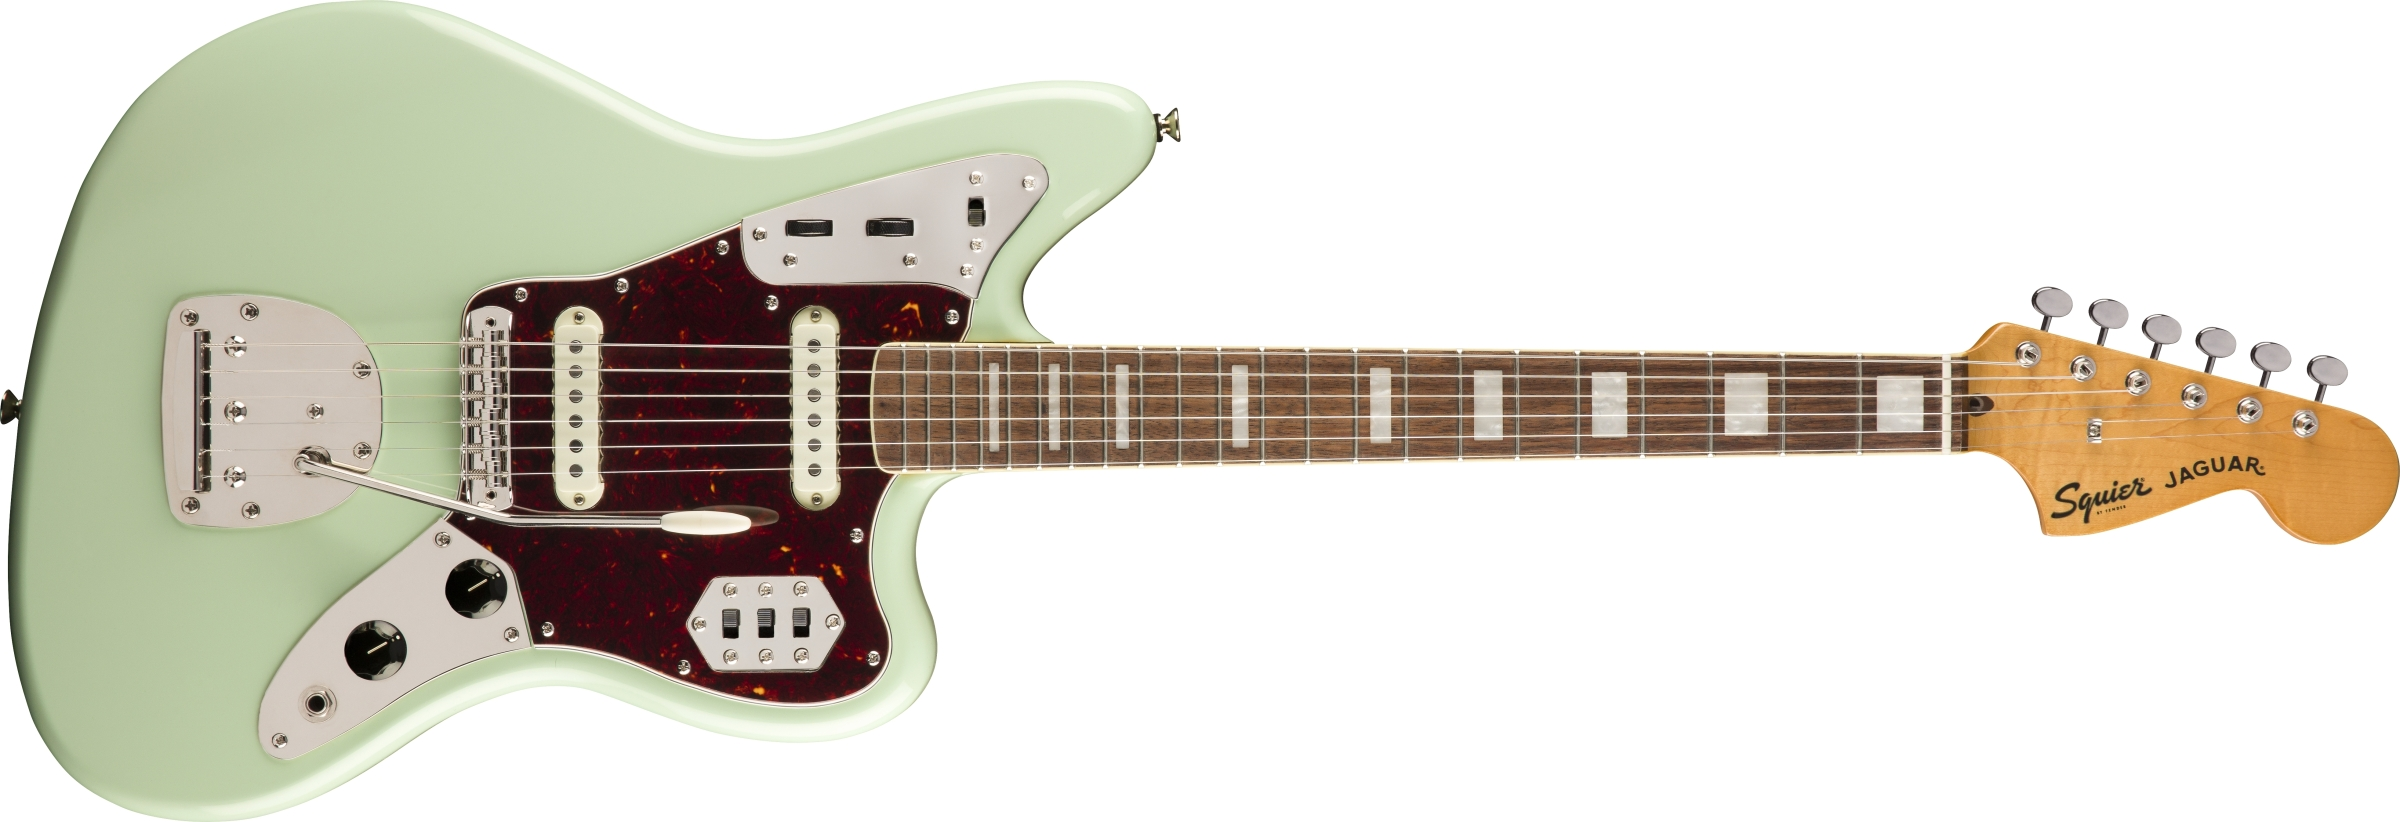 classic vibe 39 70s jaguar squier electric guitars. Black Bedroom Furniture Sets. Home Design Ideas